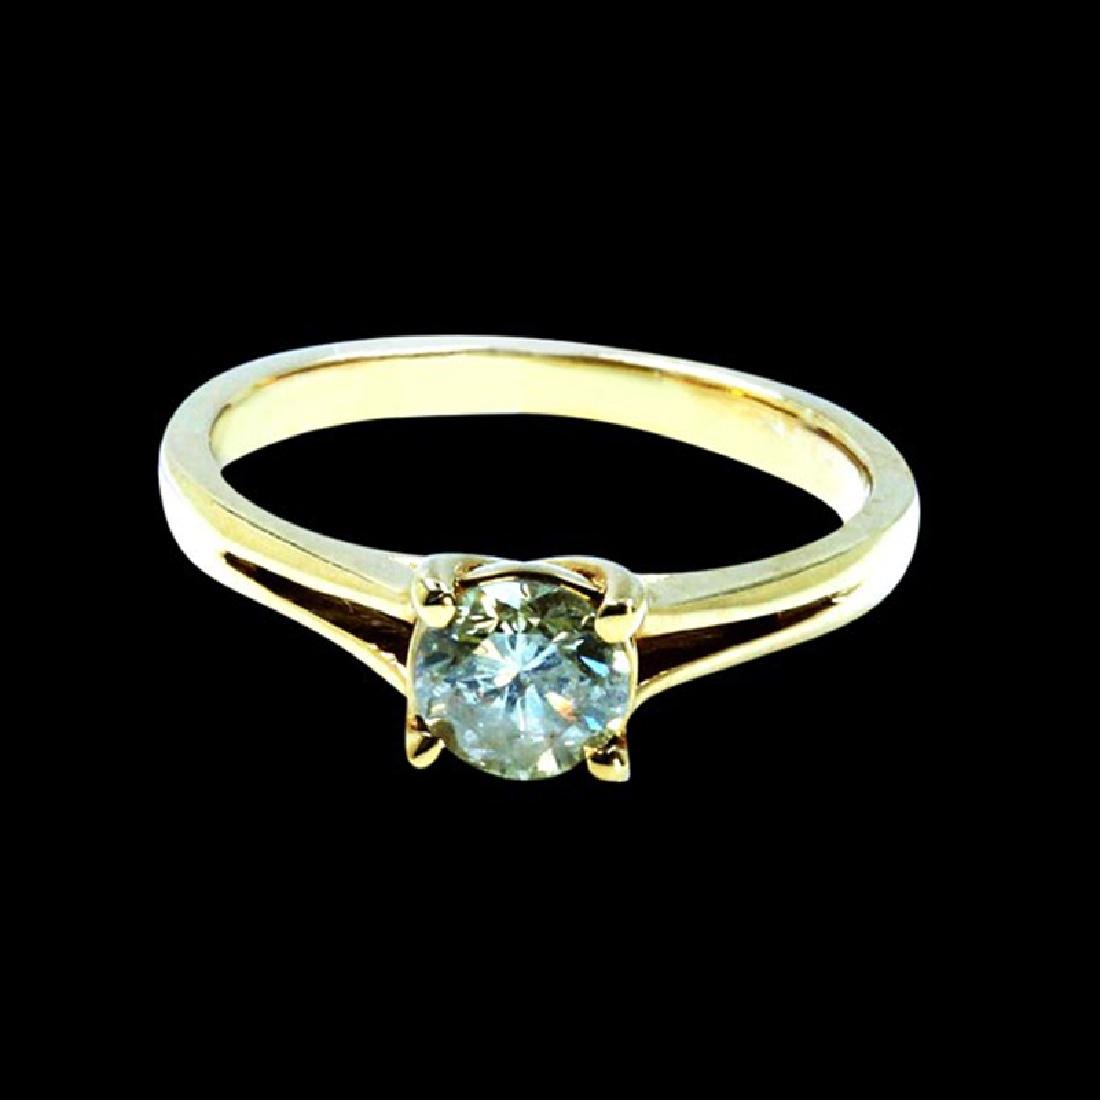 0.48CT NATURAL DIAMOND 14K YELLOW GOLD RING